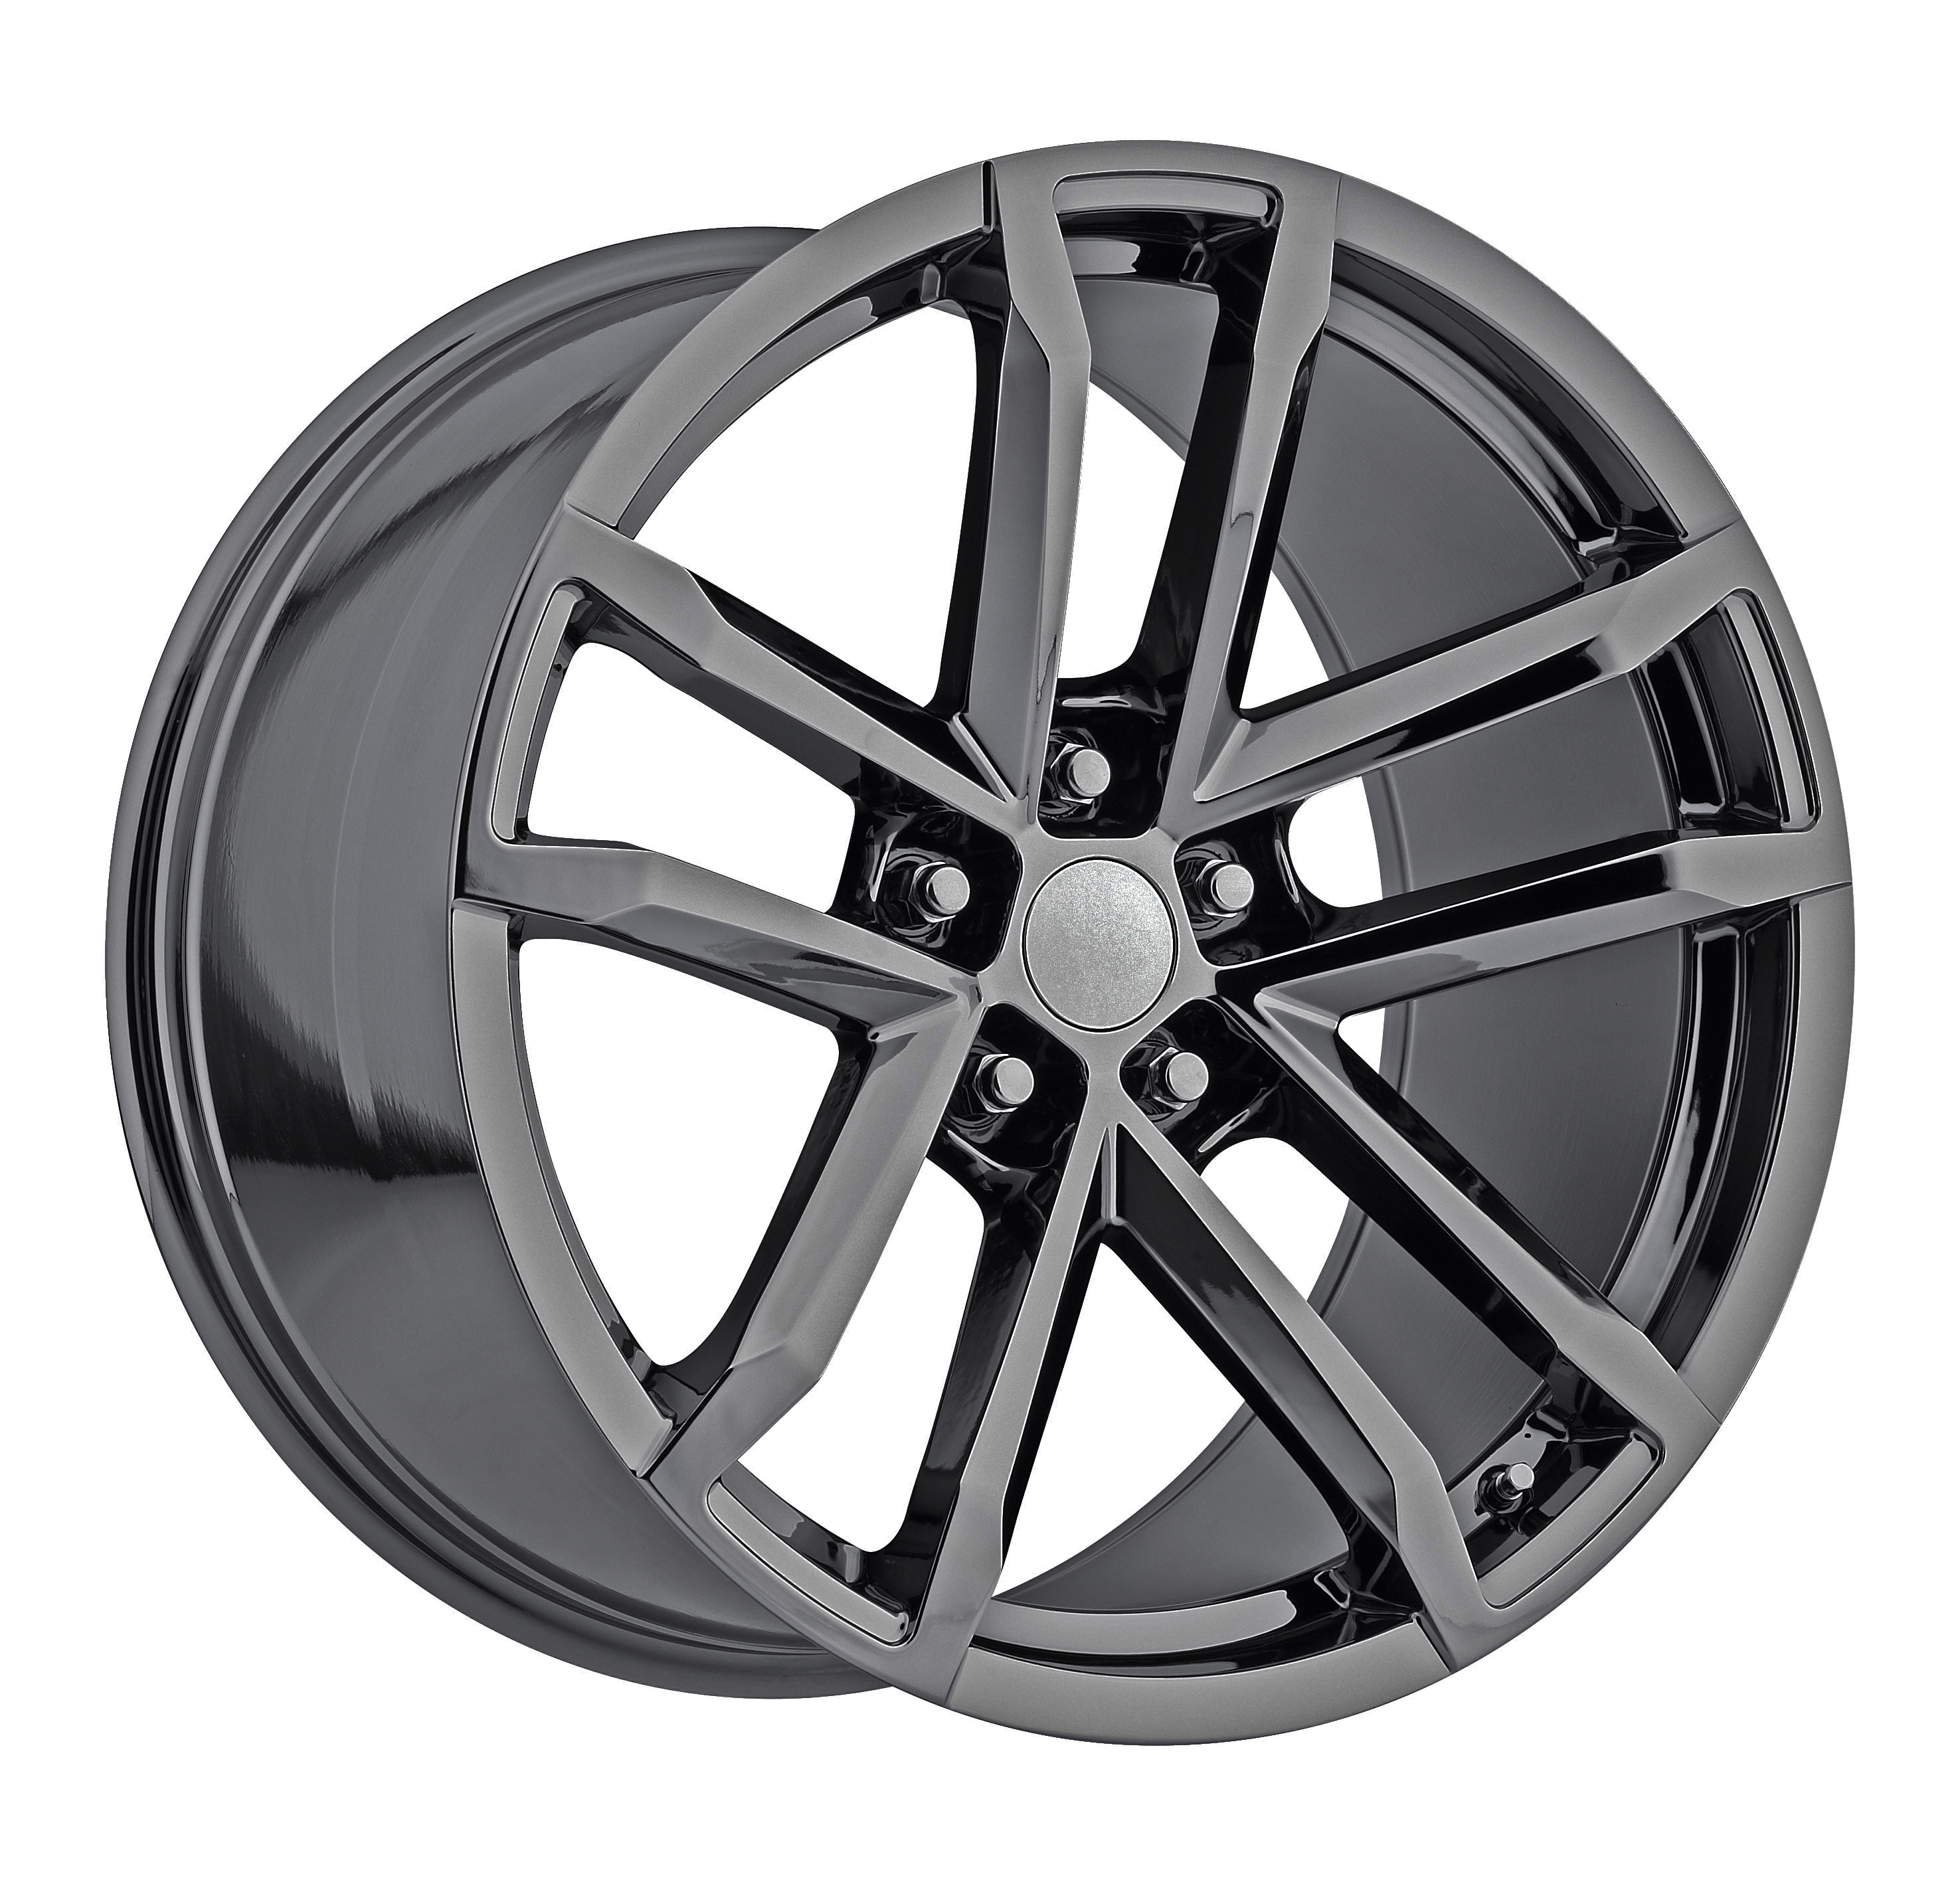 2012 Chevrolet Camaro ZL1 PVD Black Chrome Replicas